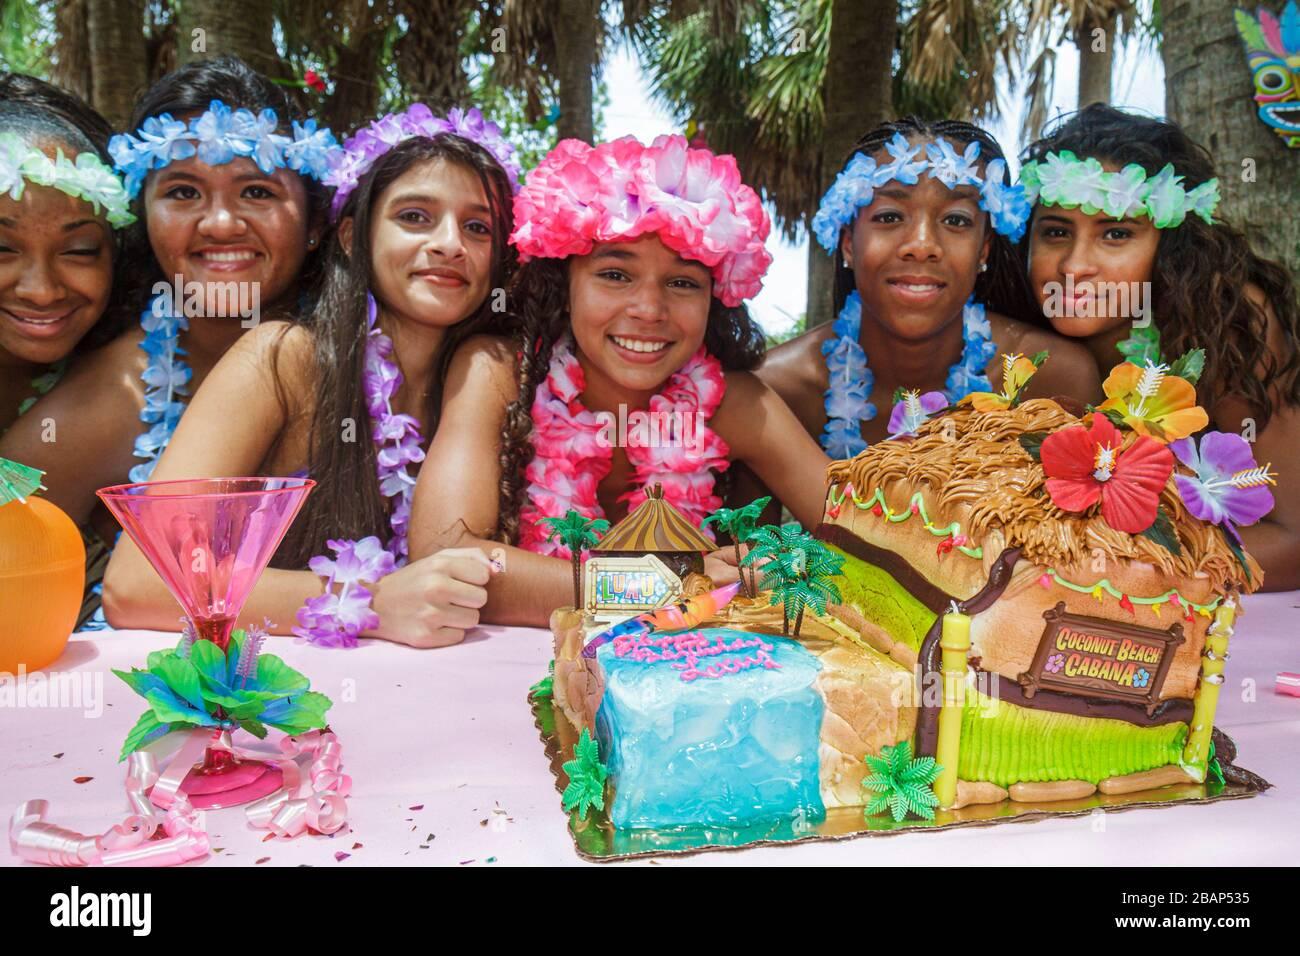 Astounding Miami Beach Florida North Beach North Shore Park Luau Party Funny Birthday Cards Online Alyptdamsfinfo